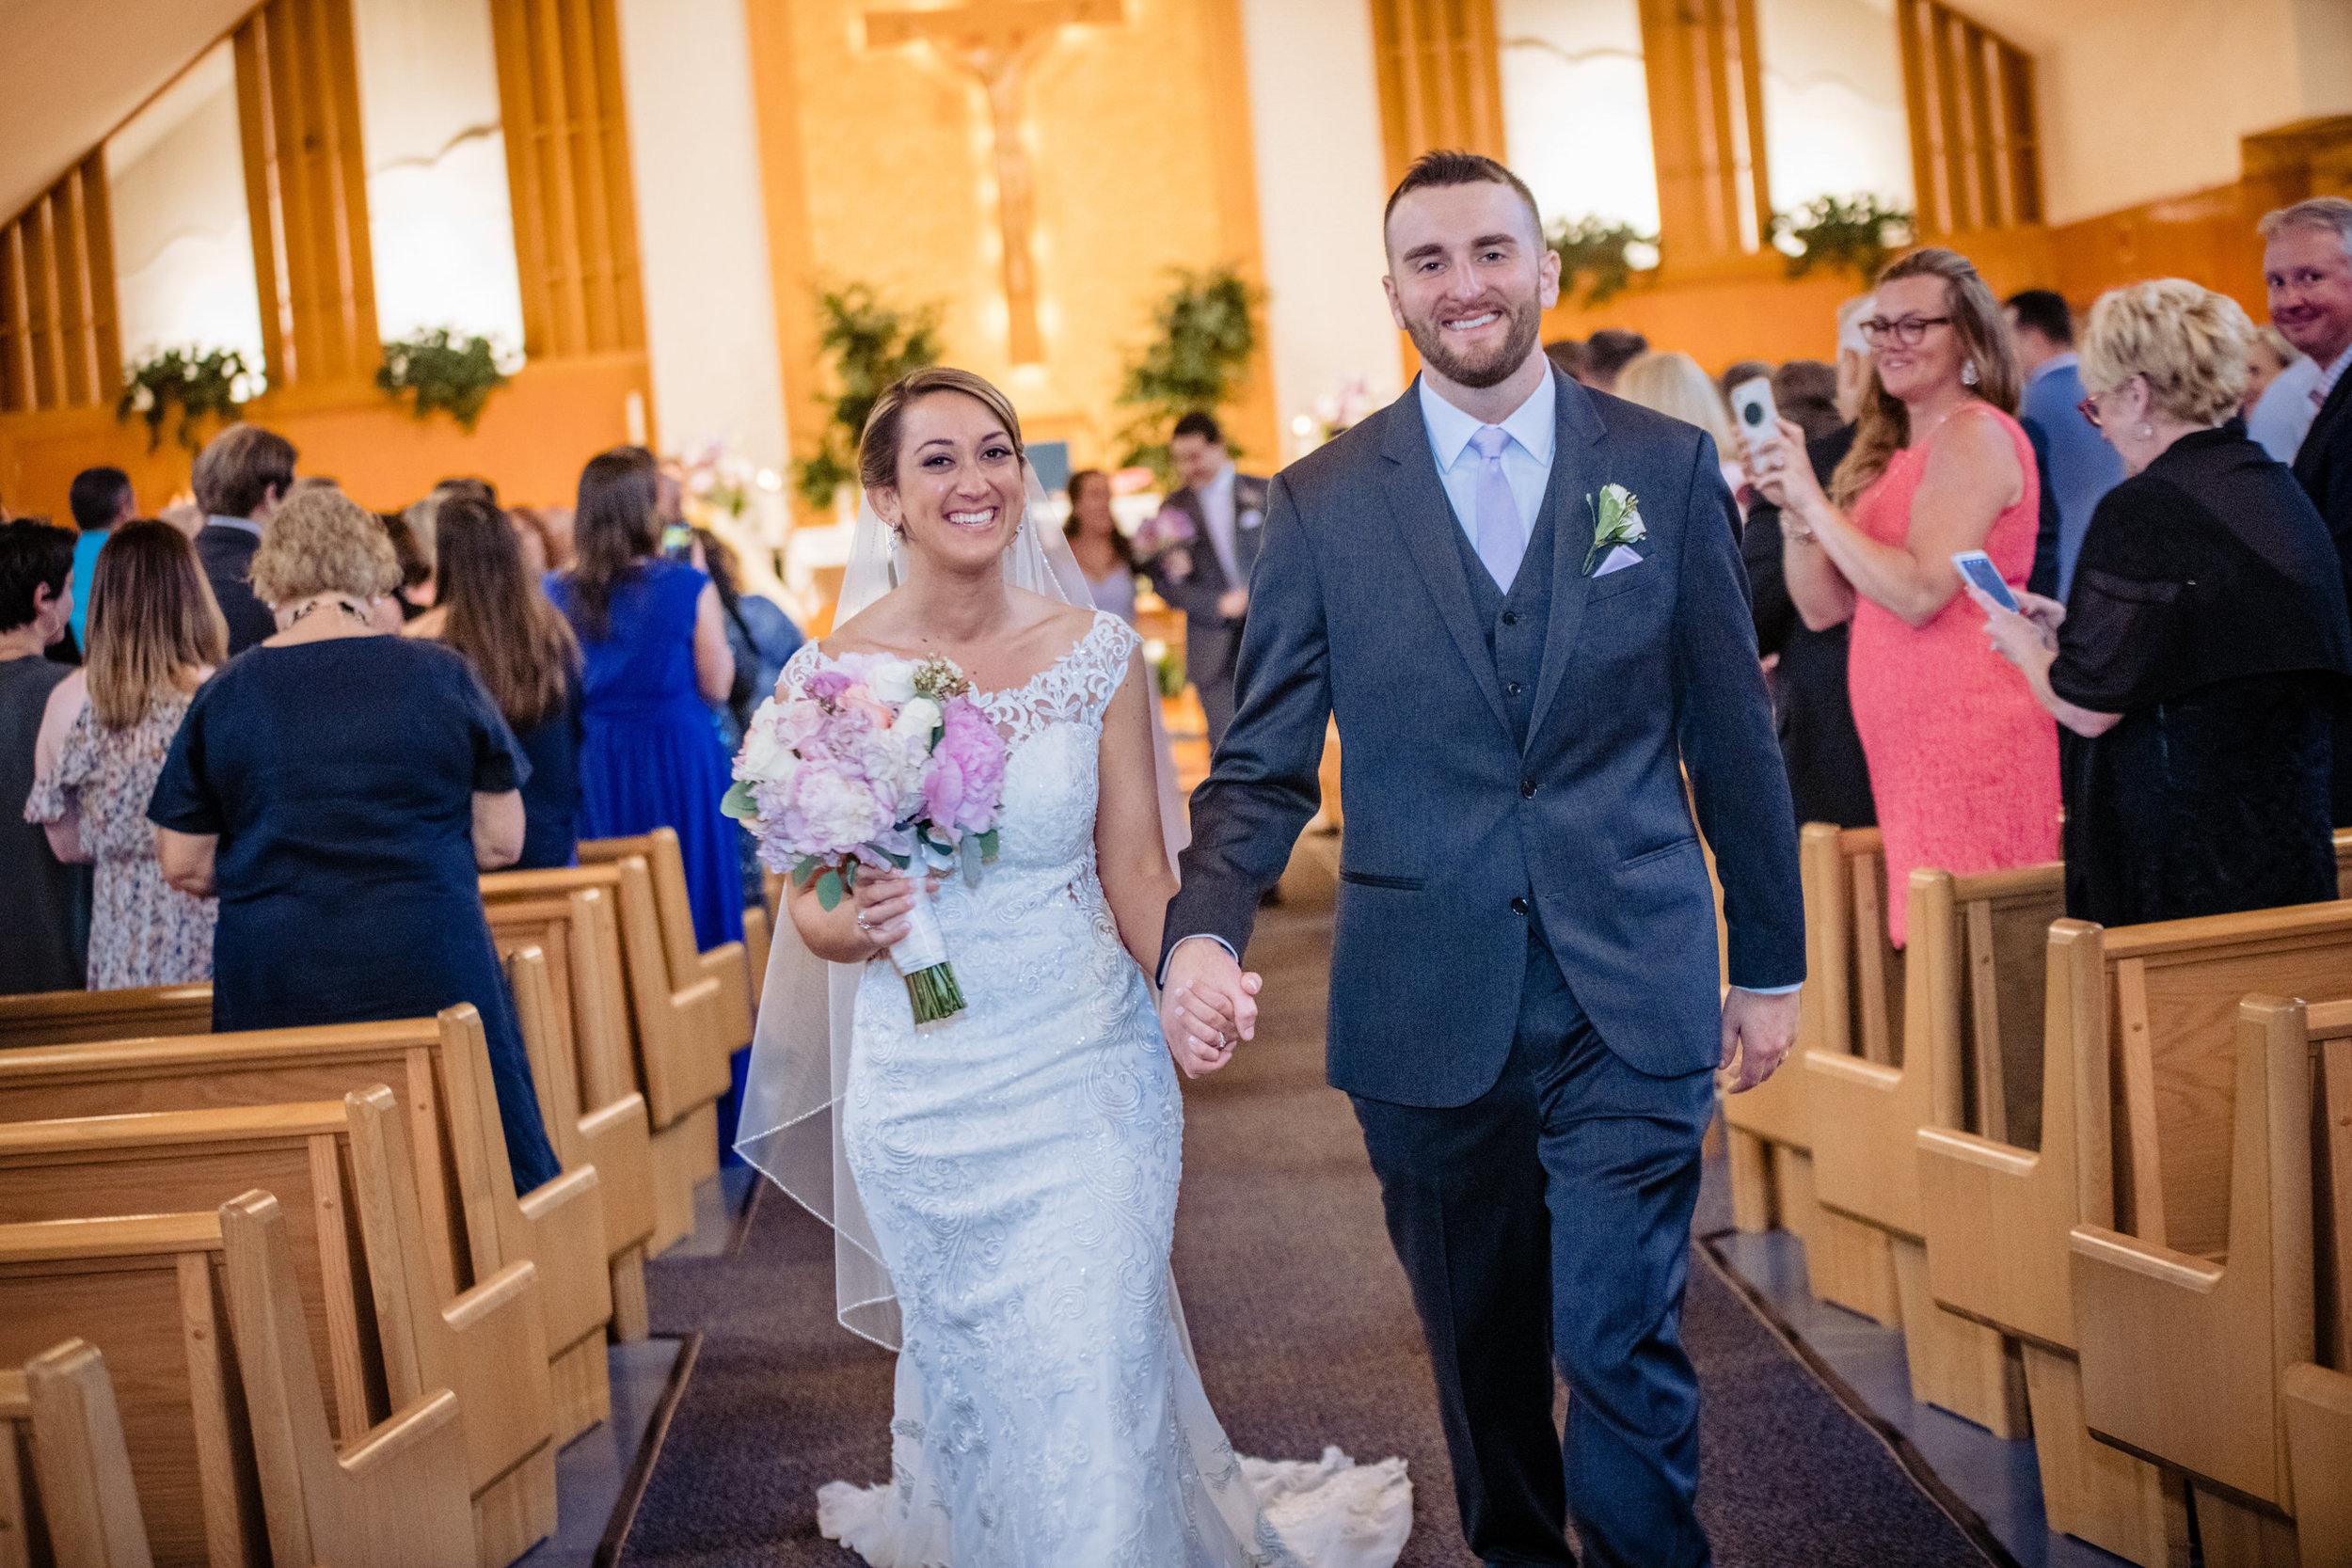 WarwickCountryClubWedding-Lauren&Alex-Ceremony-0975.jpg